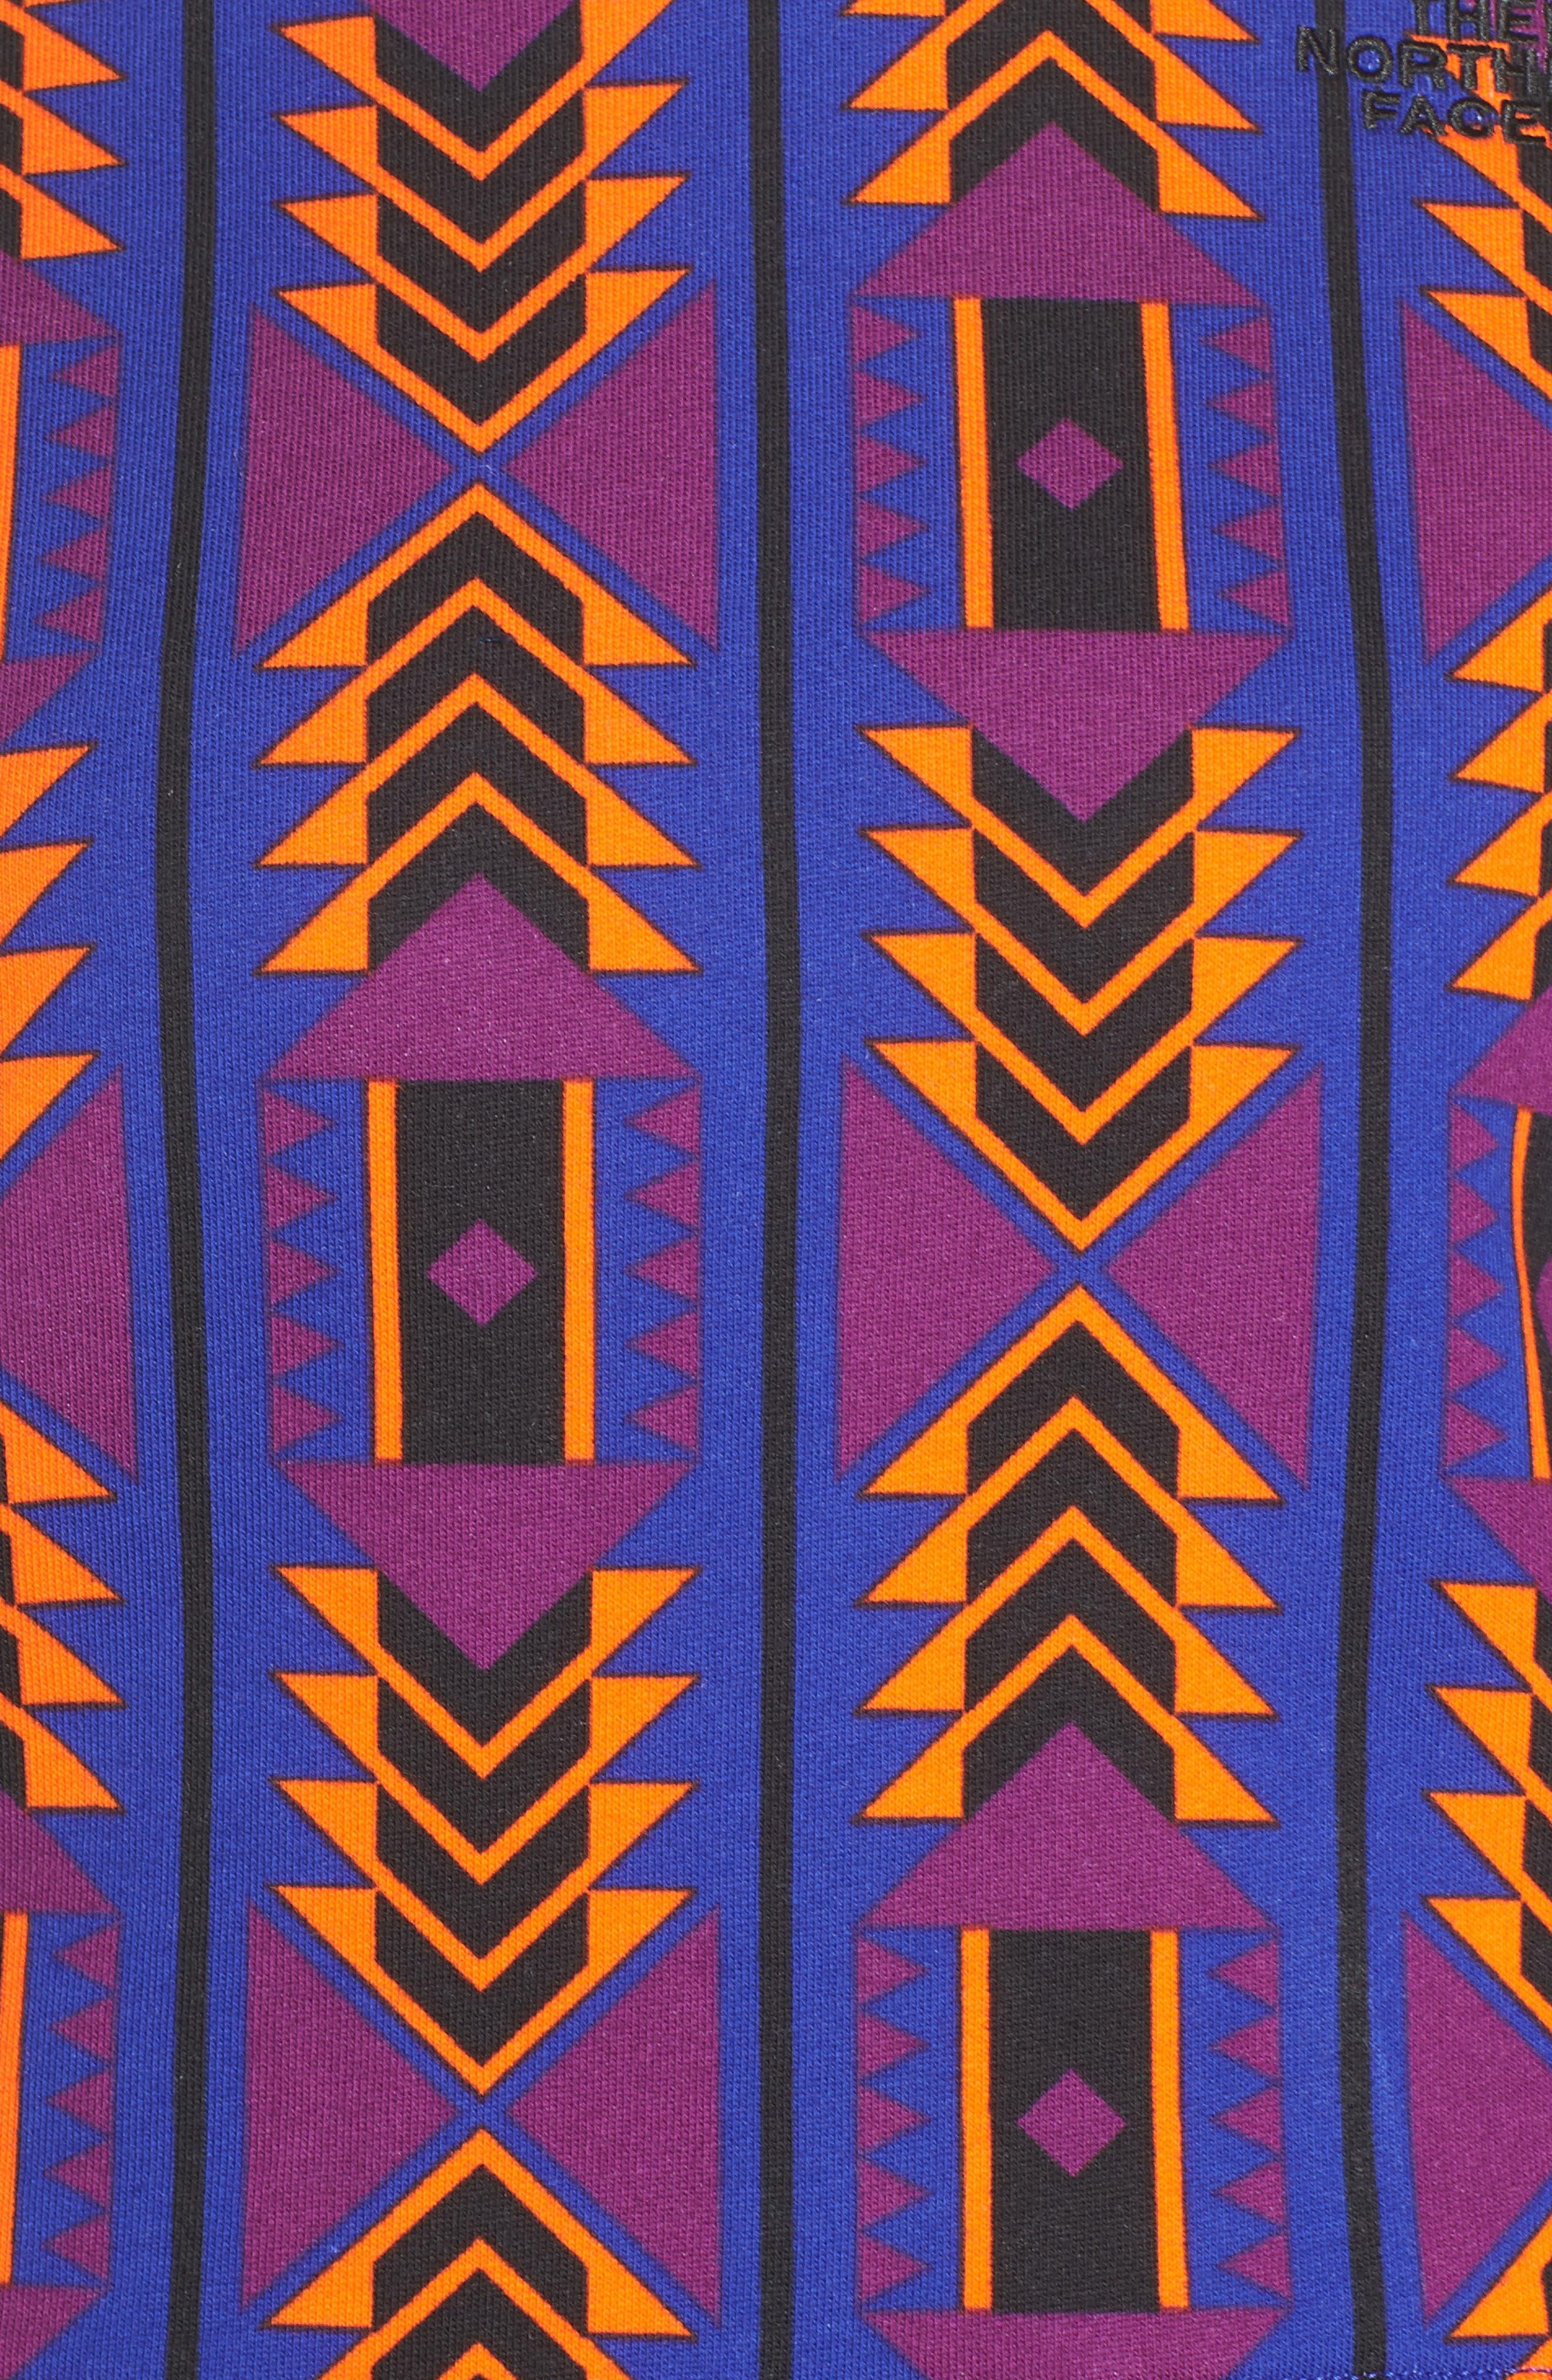 92 Rage Crop Fleece Sweatshirt,                             Alternate thumbnail 6, color,                             AZTEC BLUE 1992 RAGE PRINT